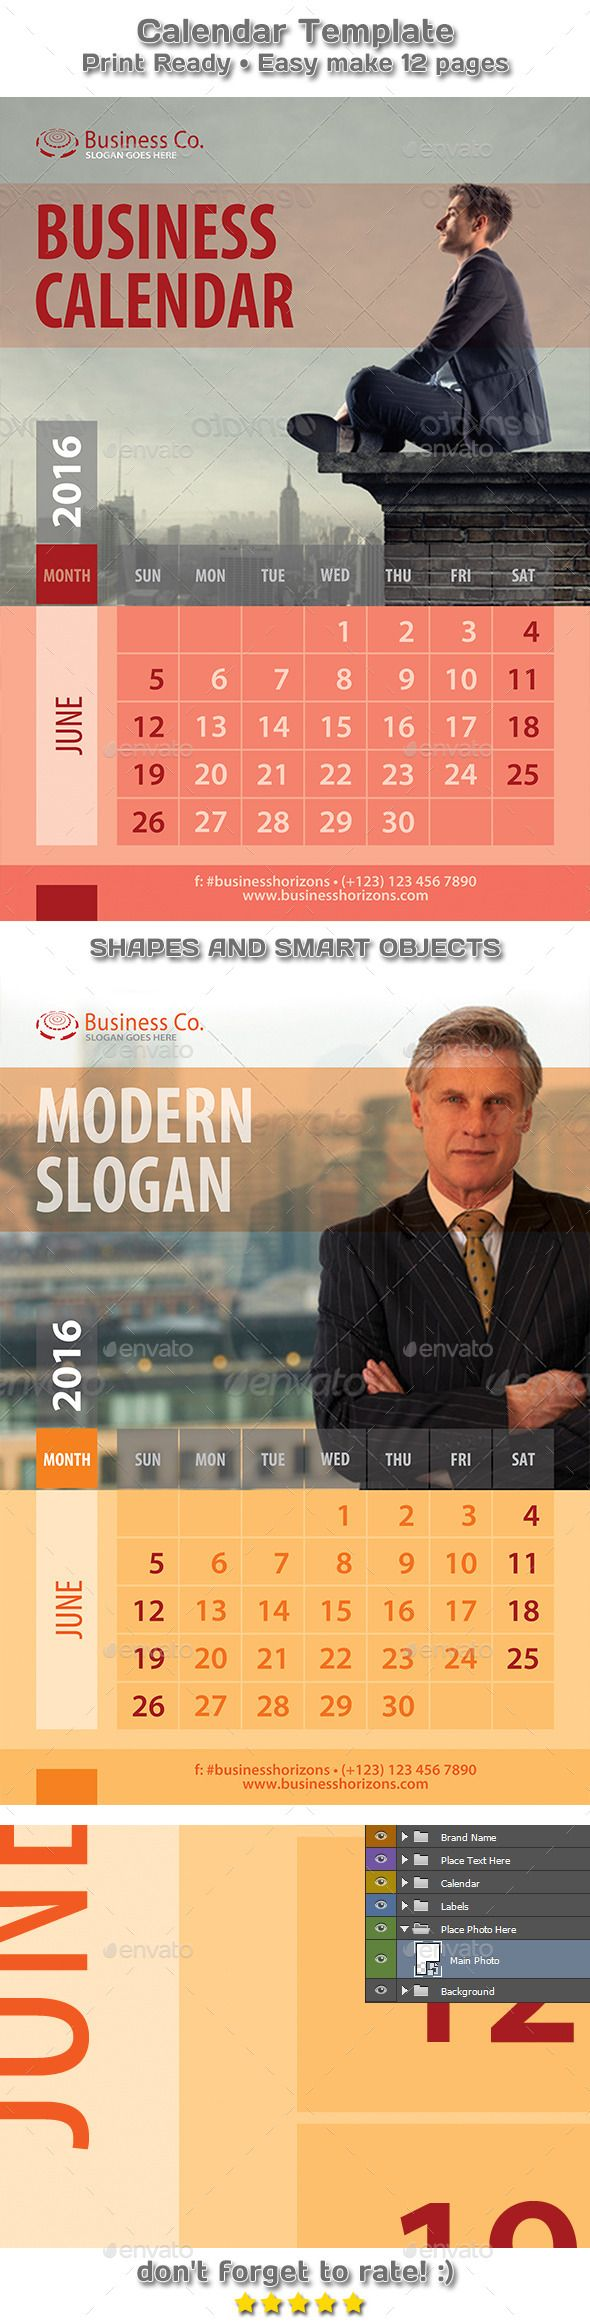 Modern Business Style Calendar 2016 Template #design Download: http://graphicriver.net/item/modern-business-style-calendar-2016-template/12498431?ref=ksioks